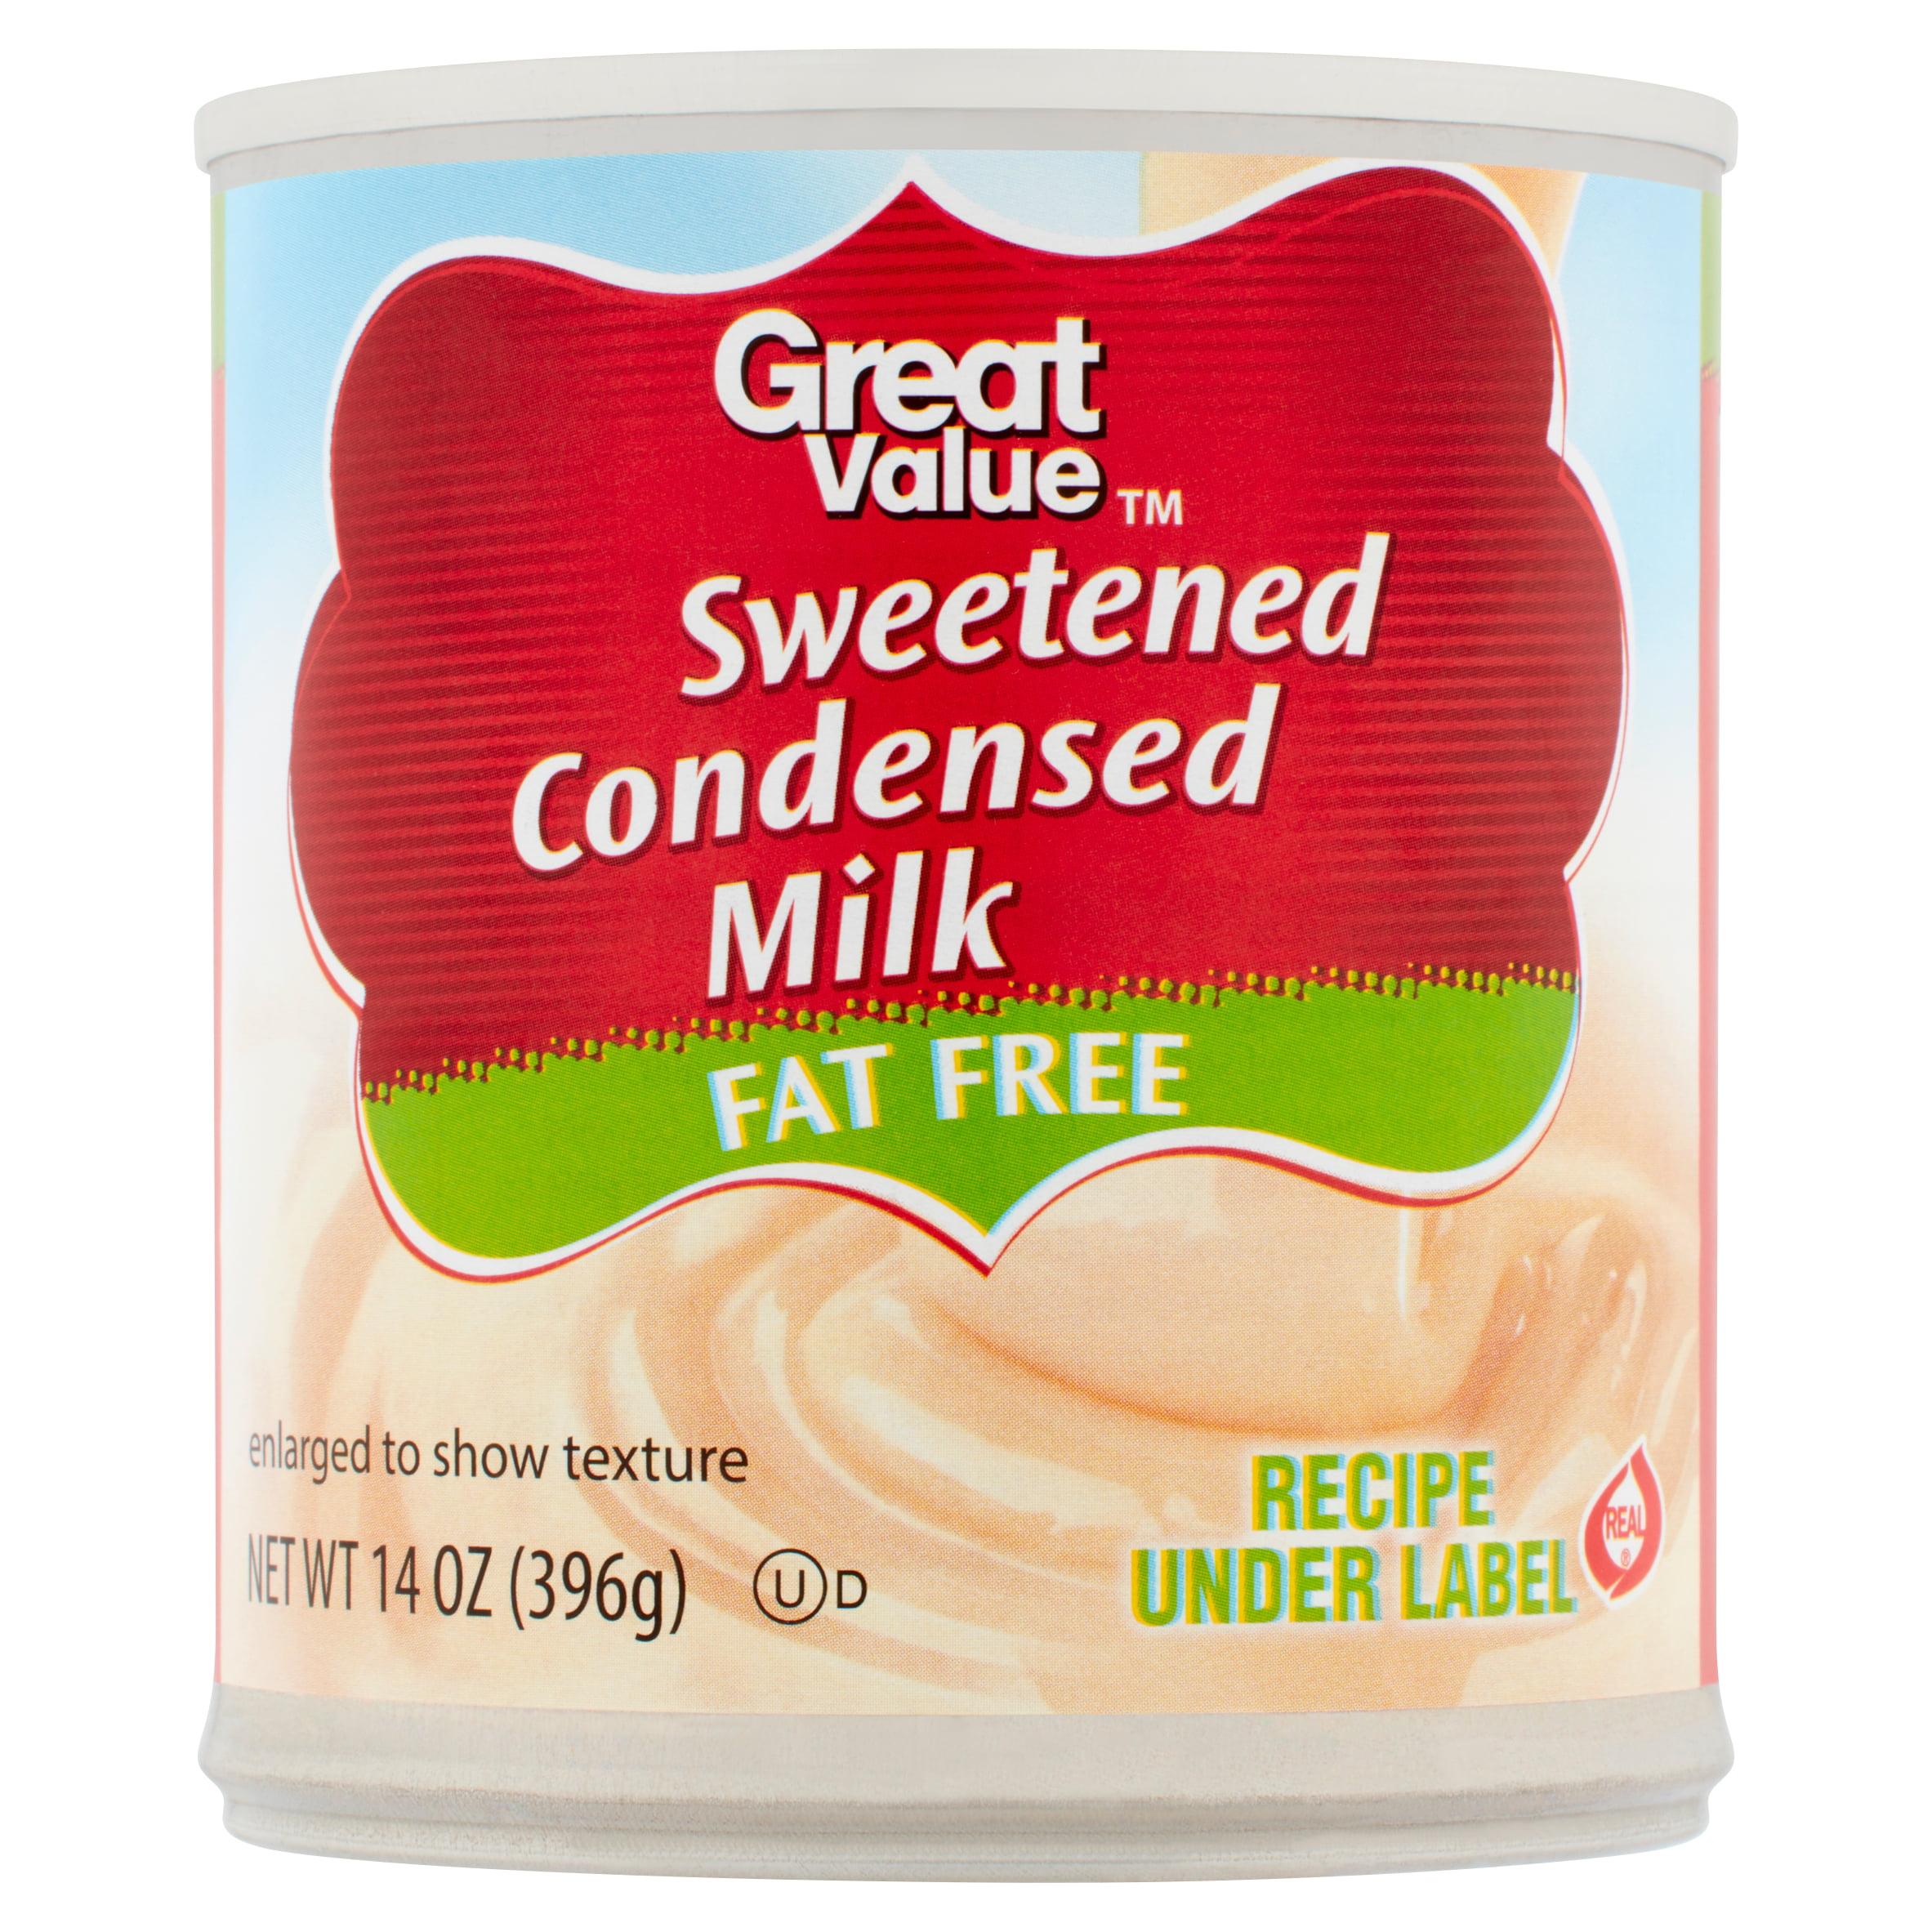 Great Value Fat Free Sweetened Condensed Milk 14 oz Walmart